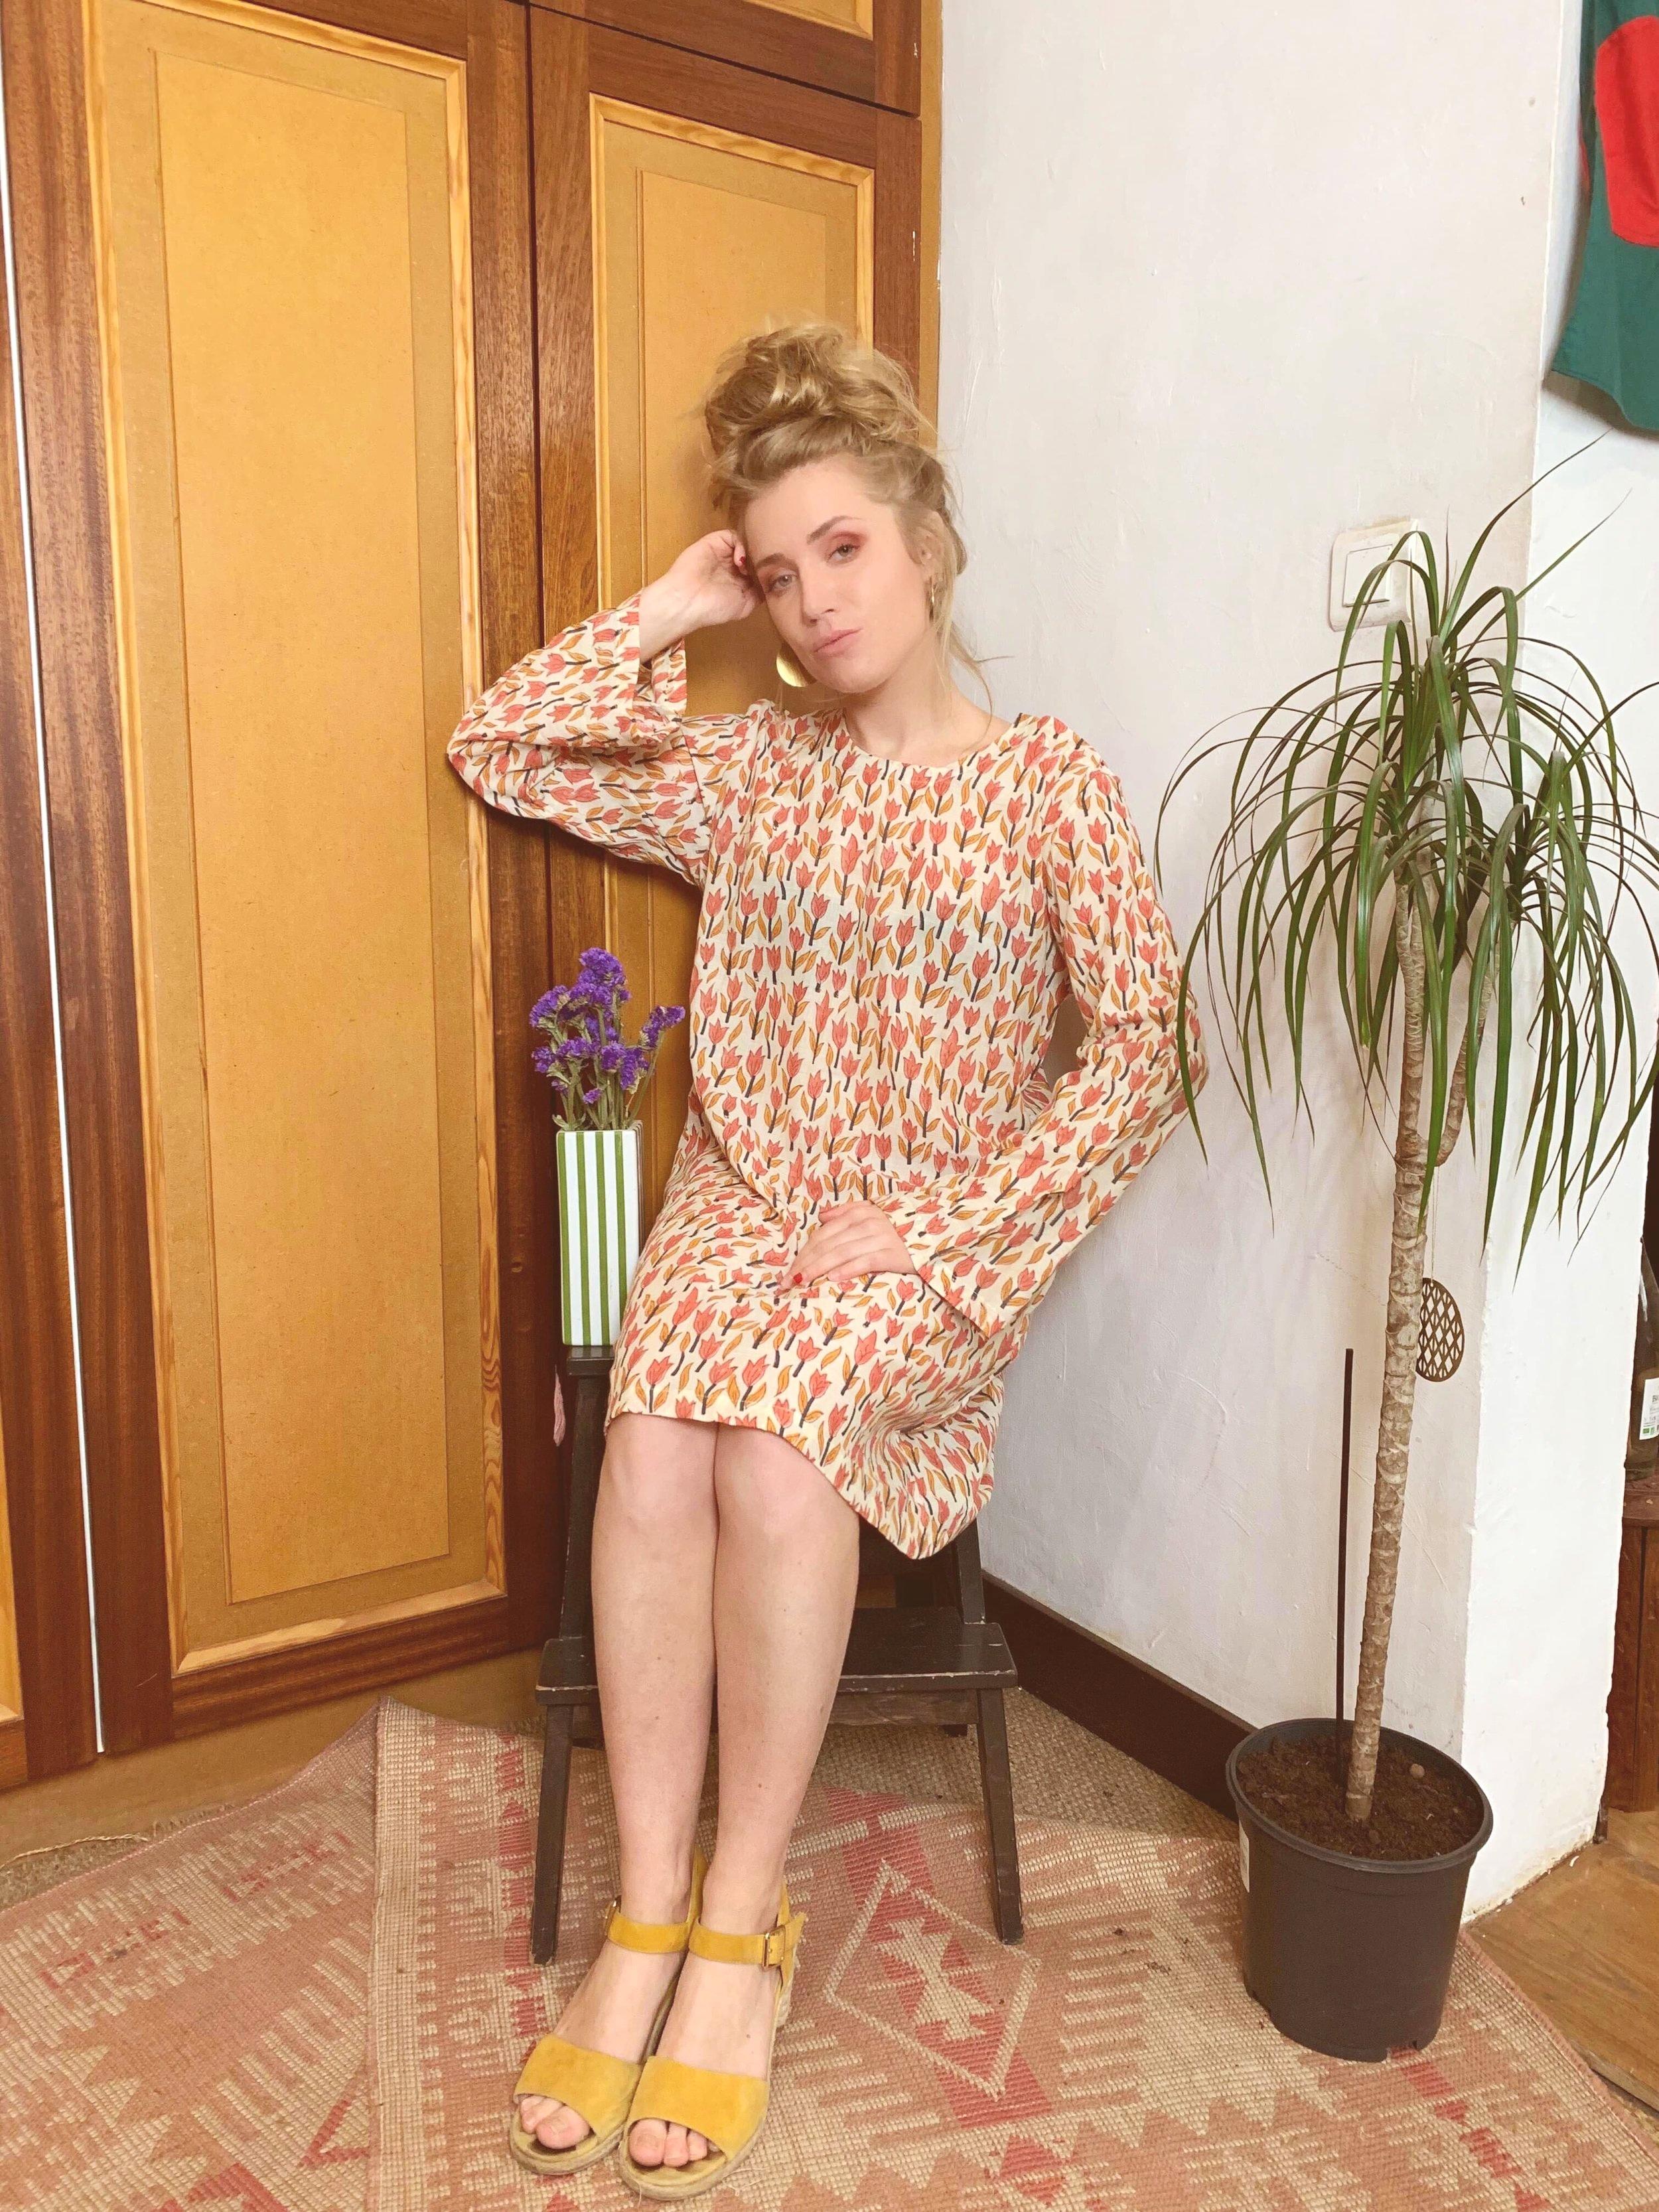 SARAH_PINKFLOWERDRESS_CHARZA19